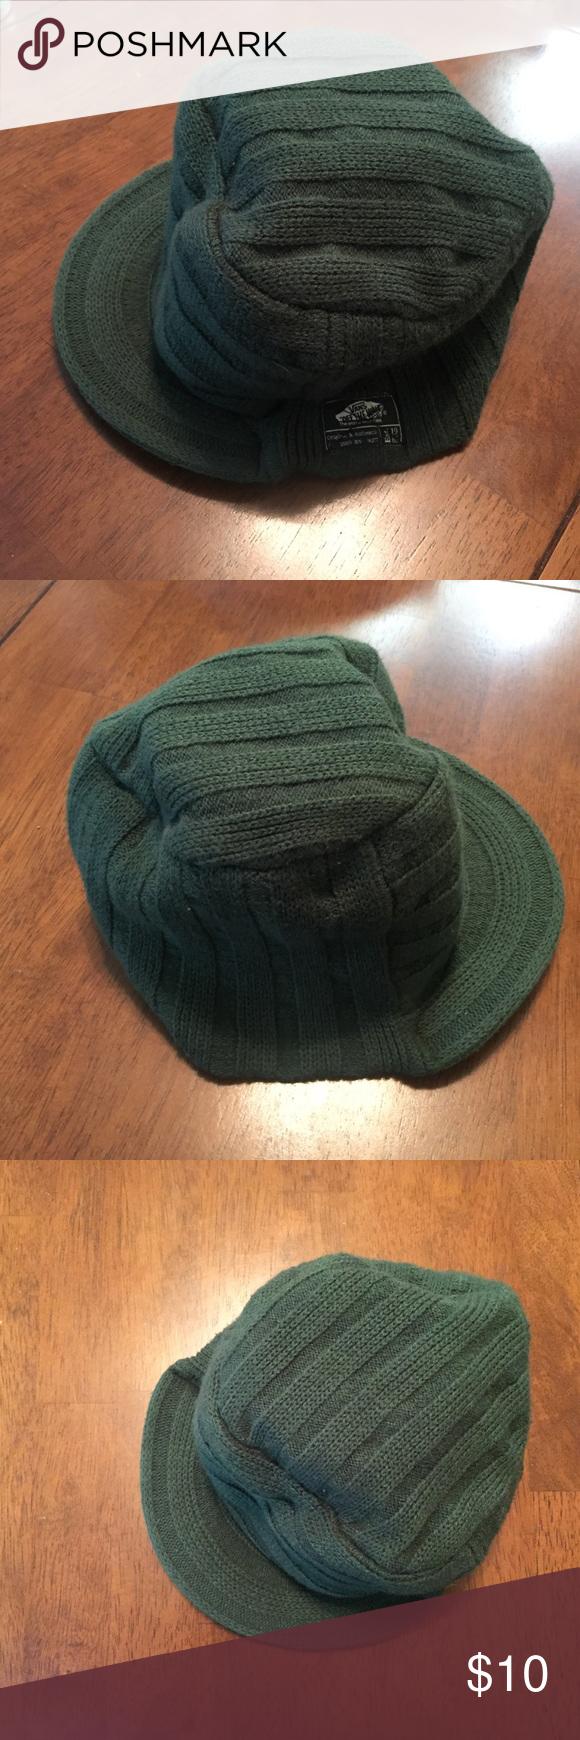 6a3d81295ef Vans beanie with brim Vans olive green knit beanie